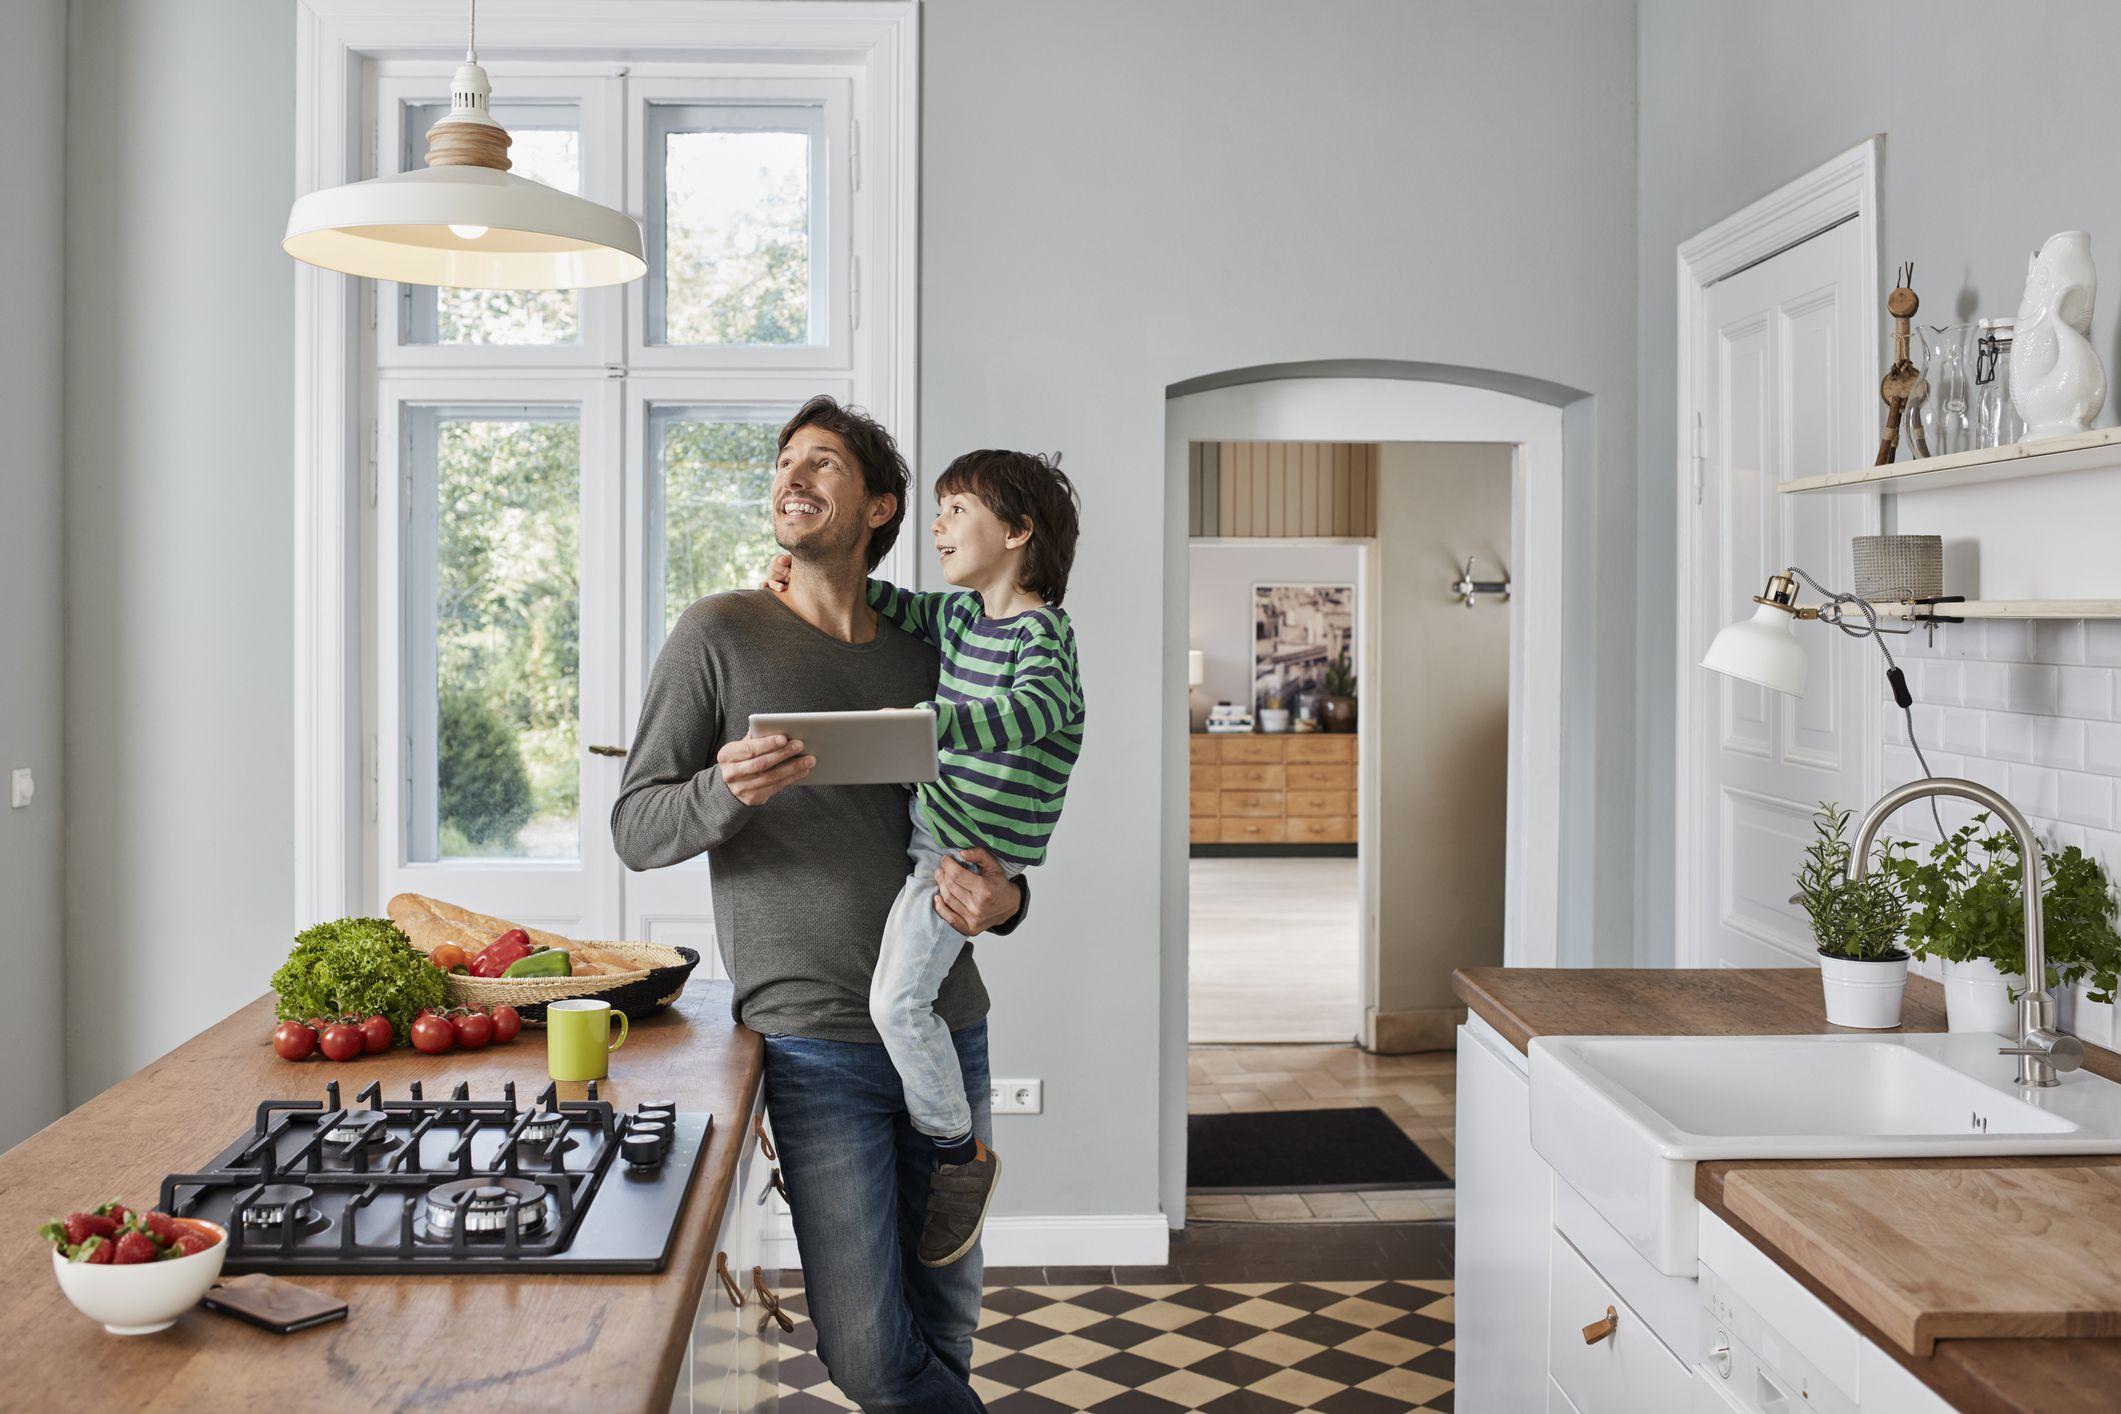 Your Kitchen Should Promote Positive Energy